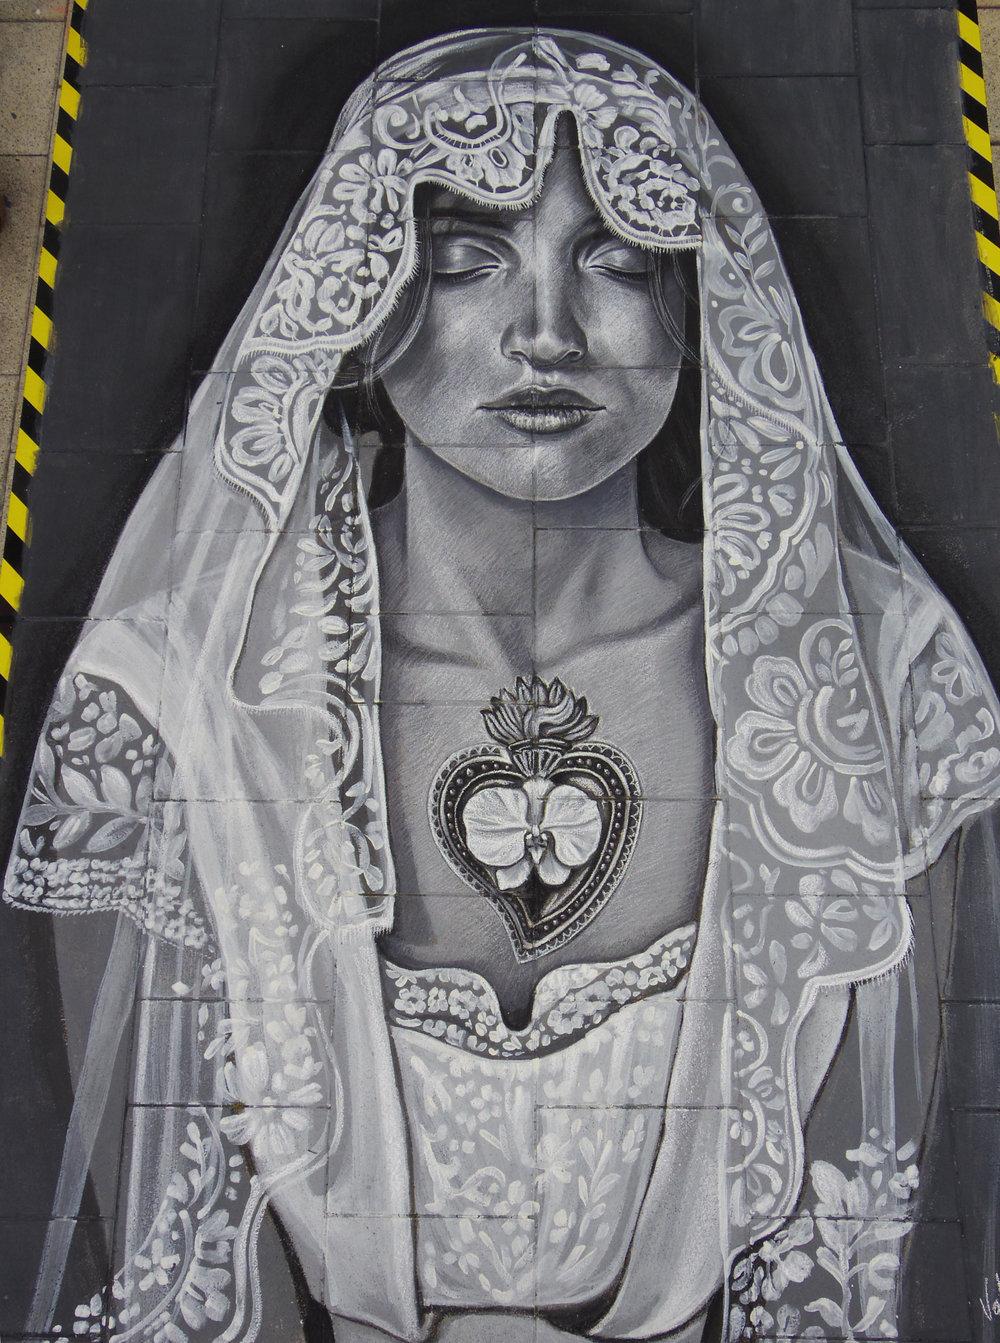 Valentina Sforzini_%22Pure2%22_Whv2014.jpg